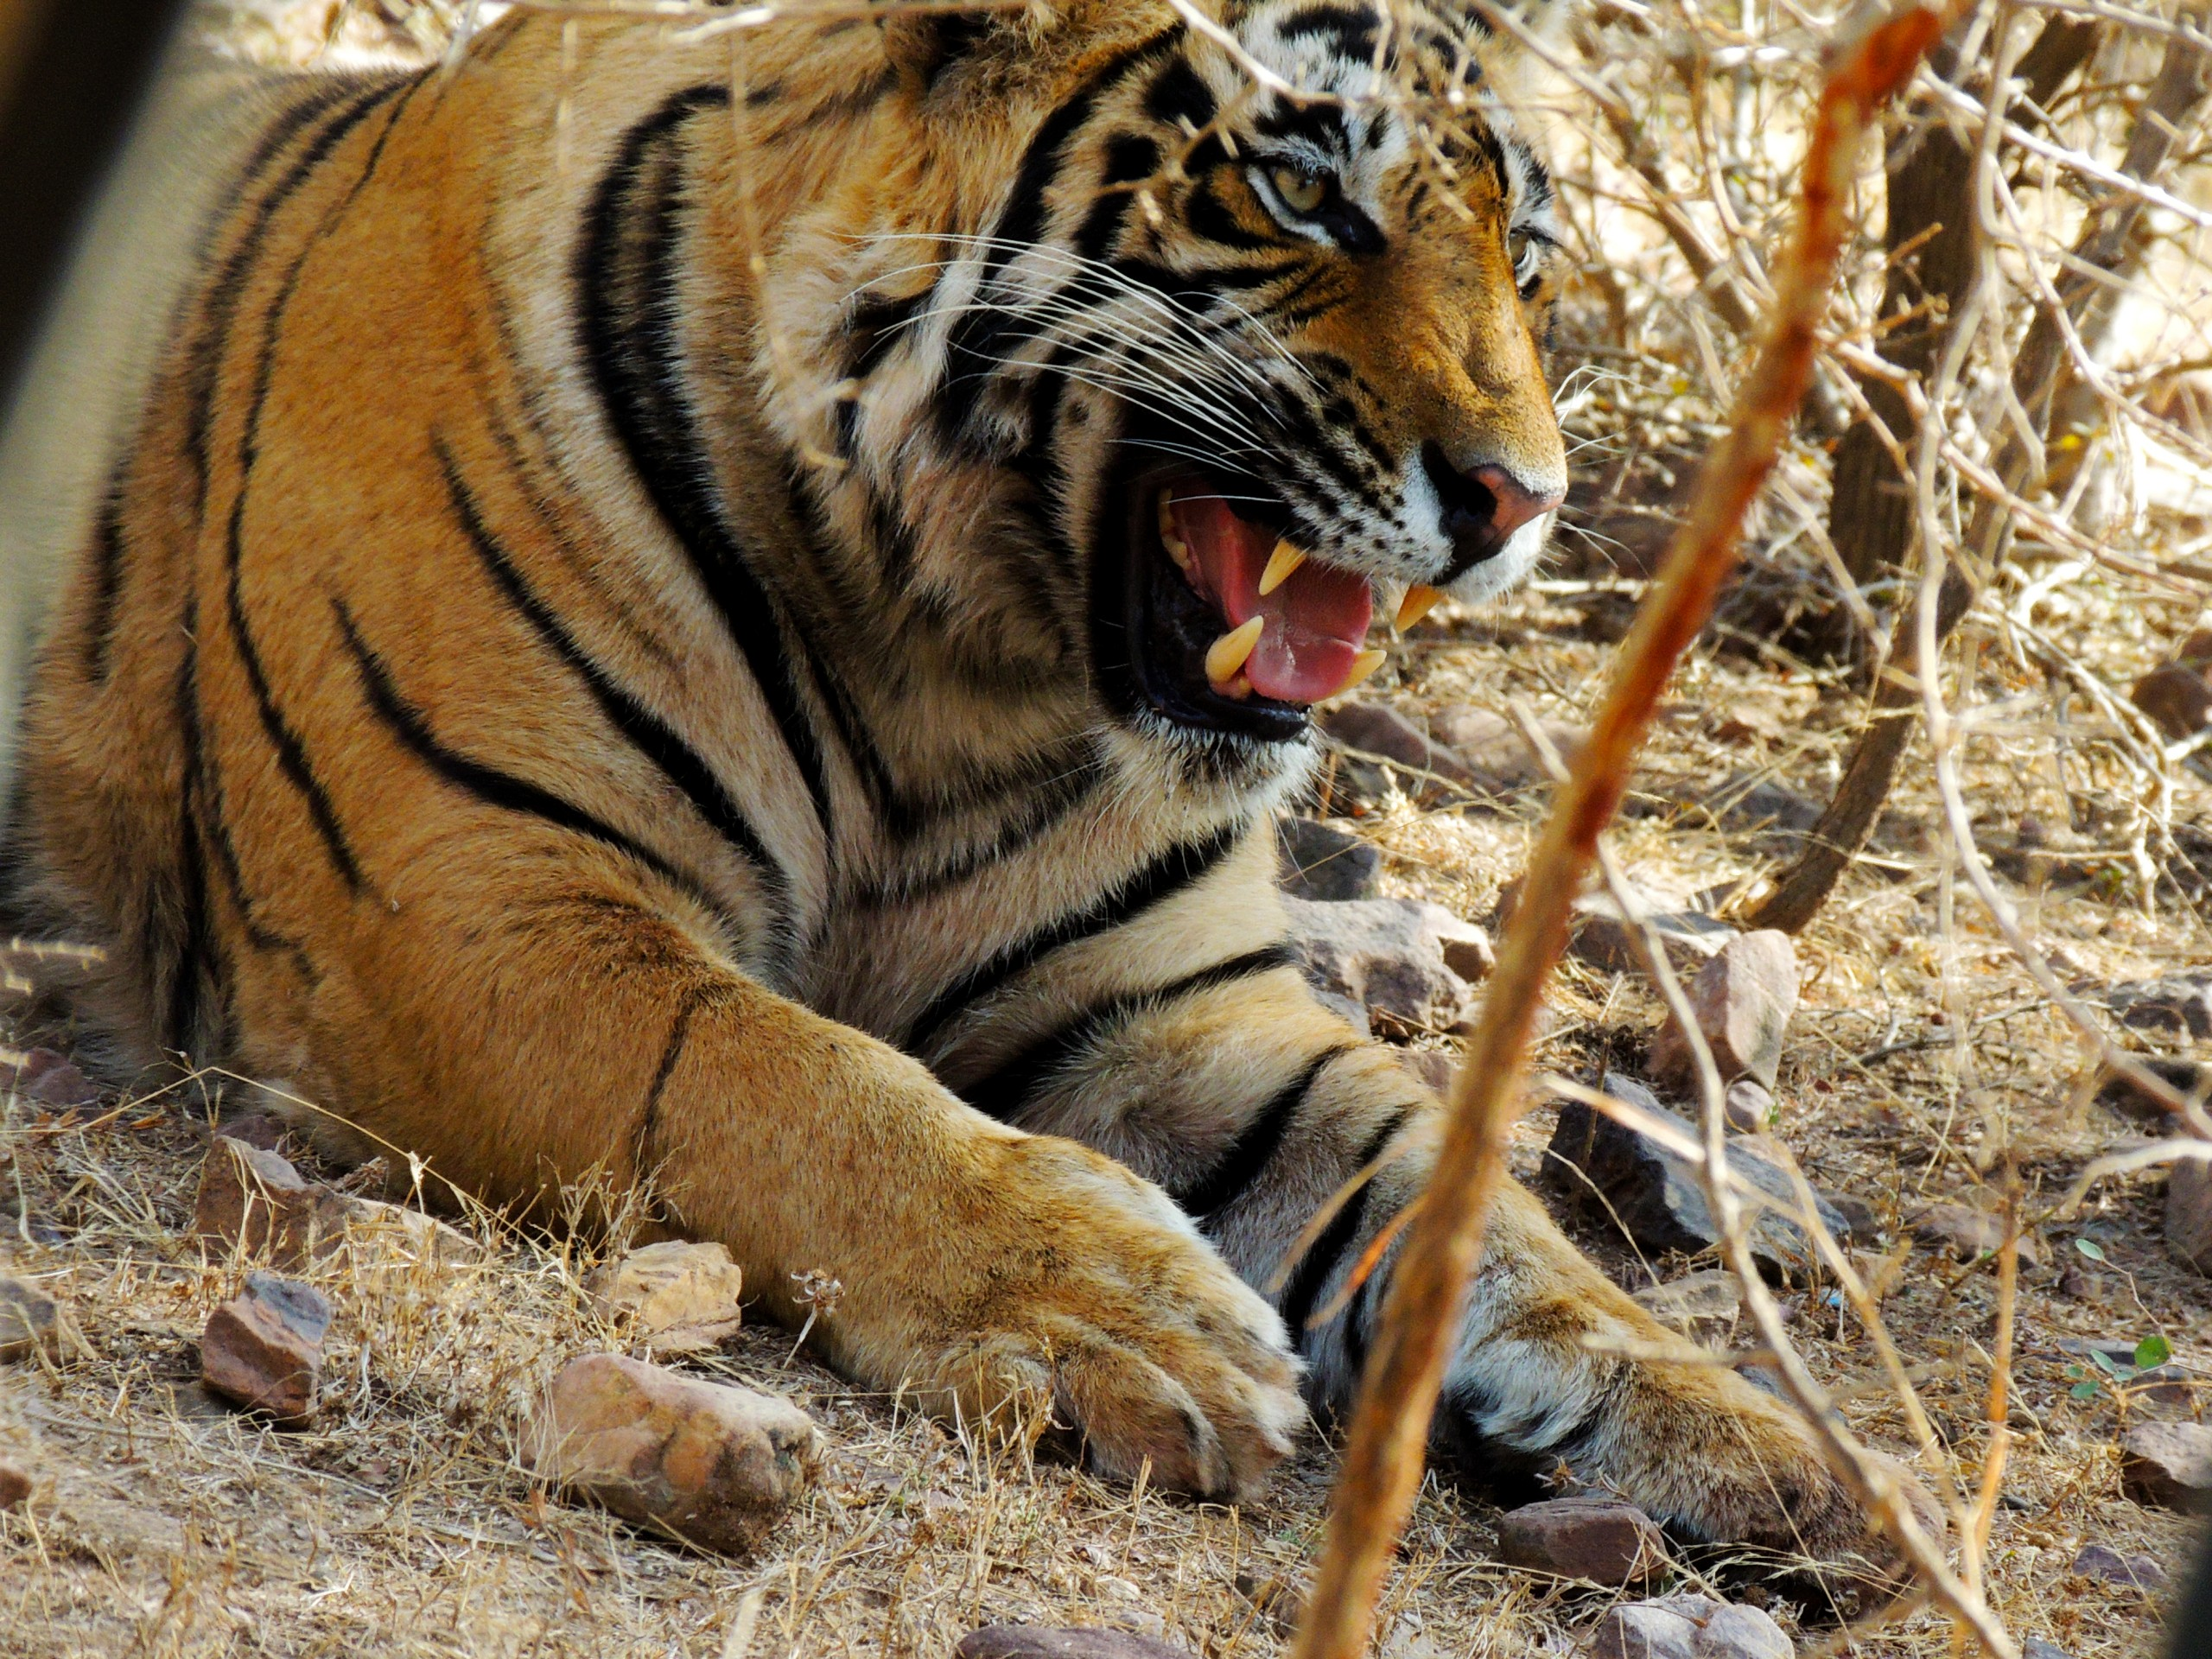 Tiger on Focus